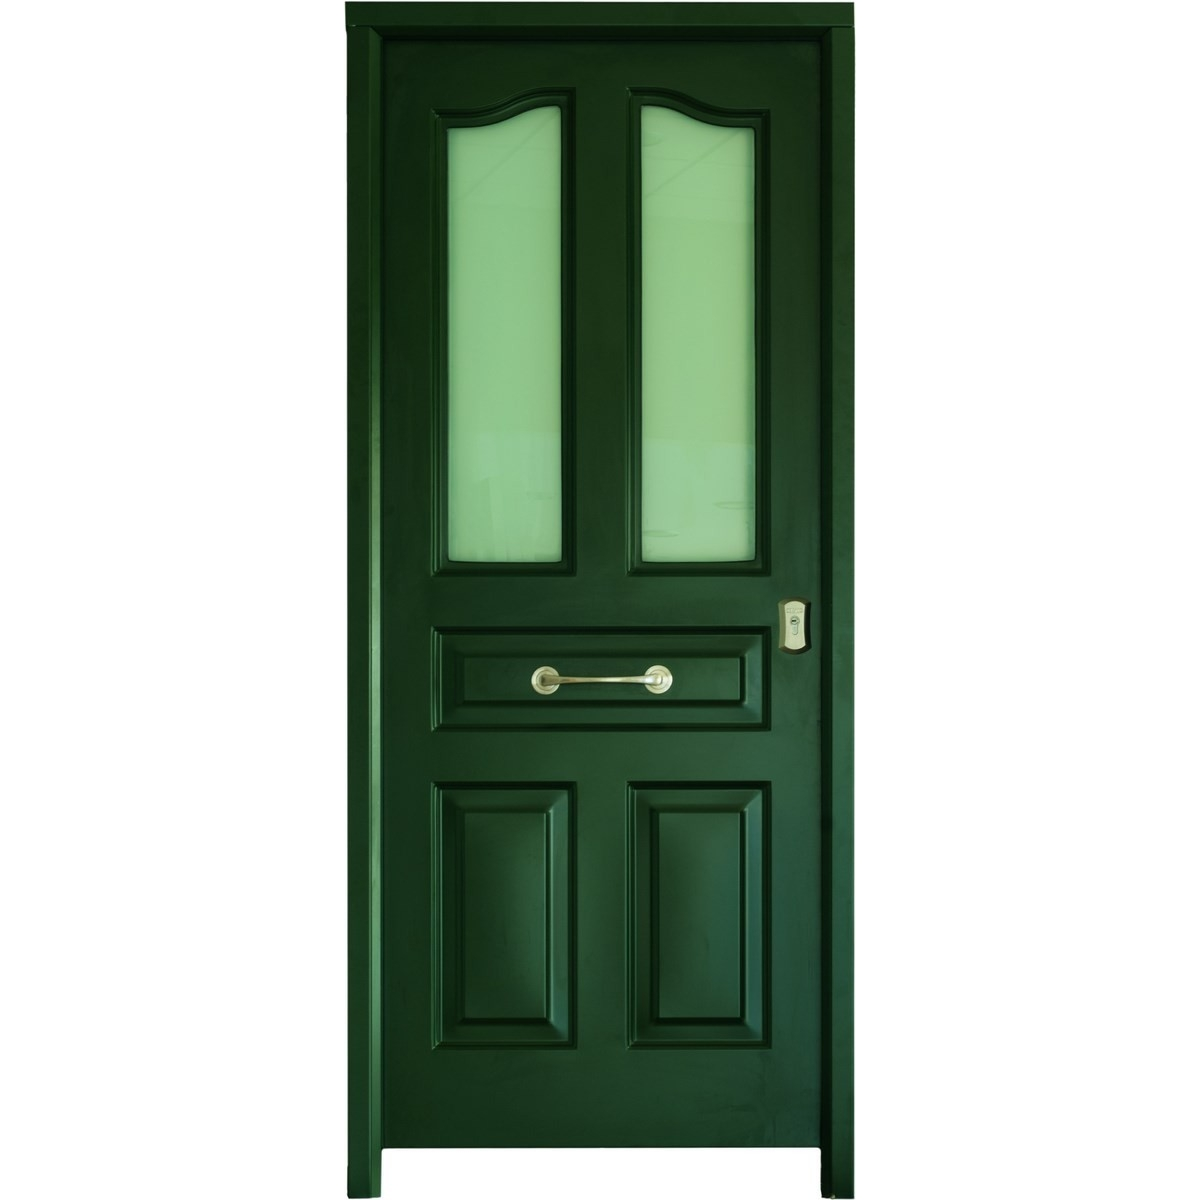 Puerta acorazada Antique Glass 2